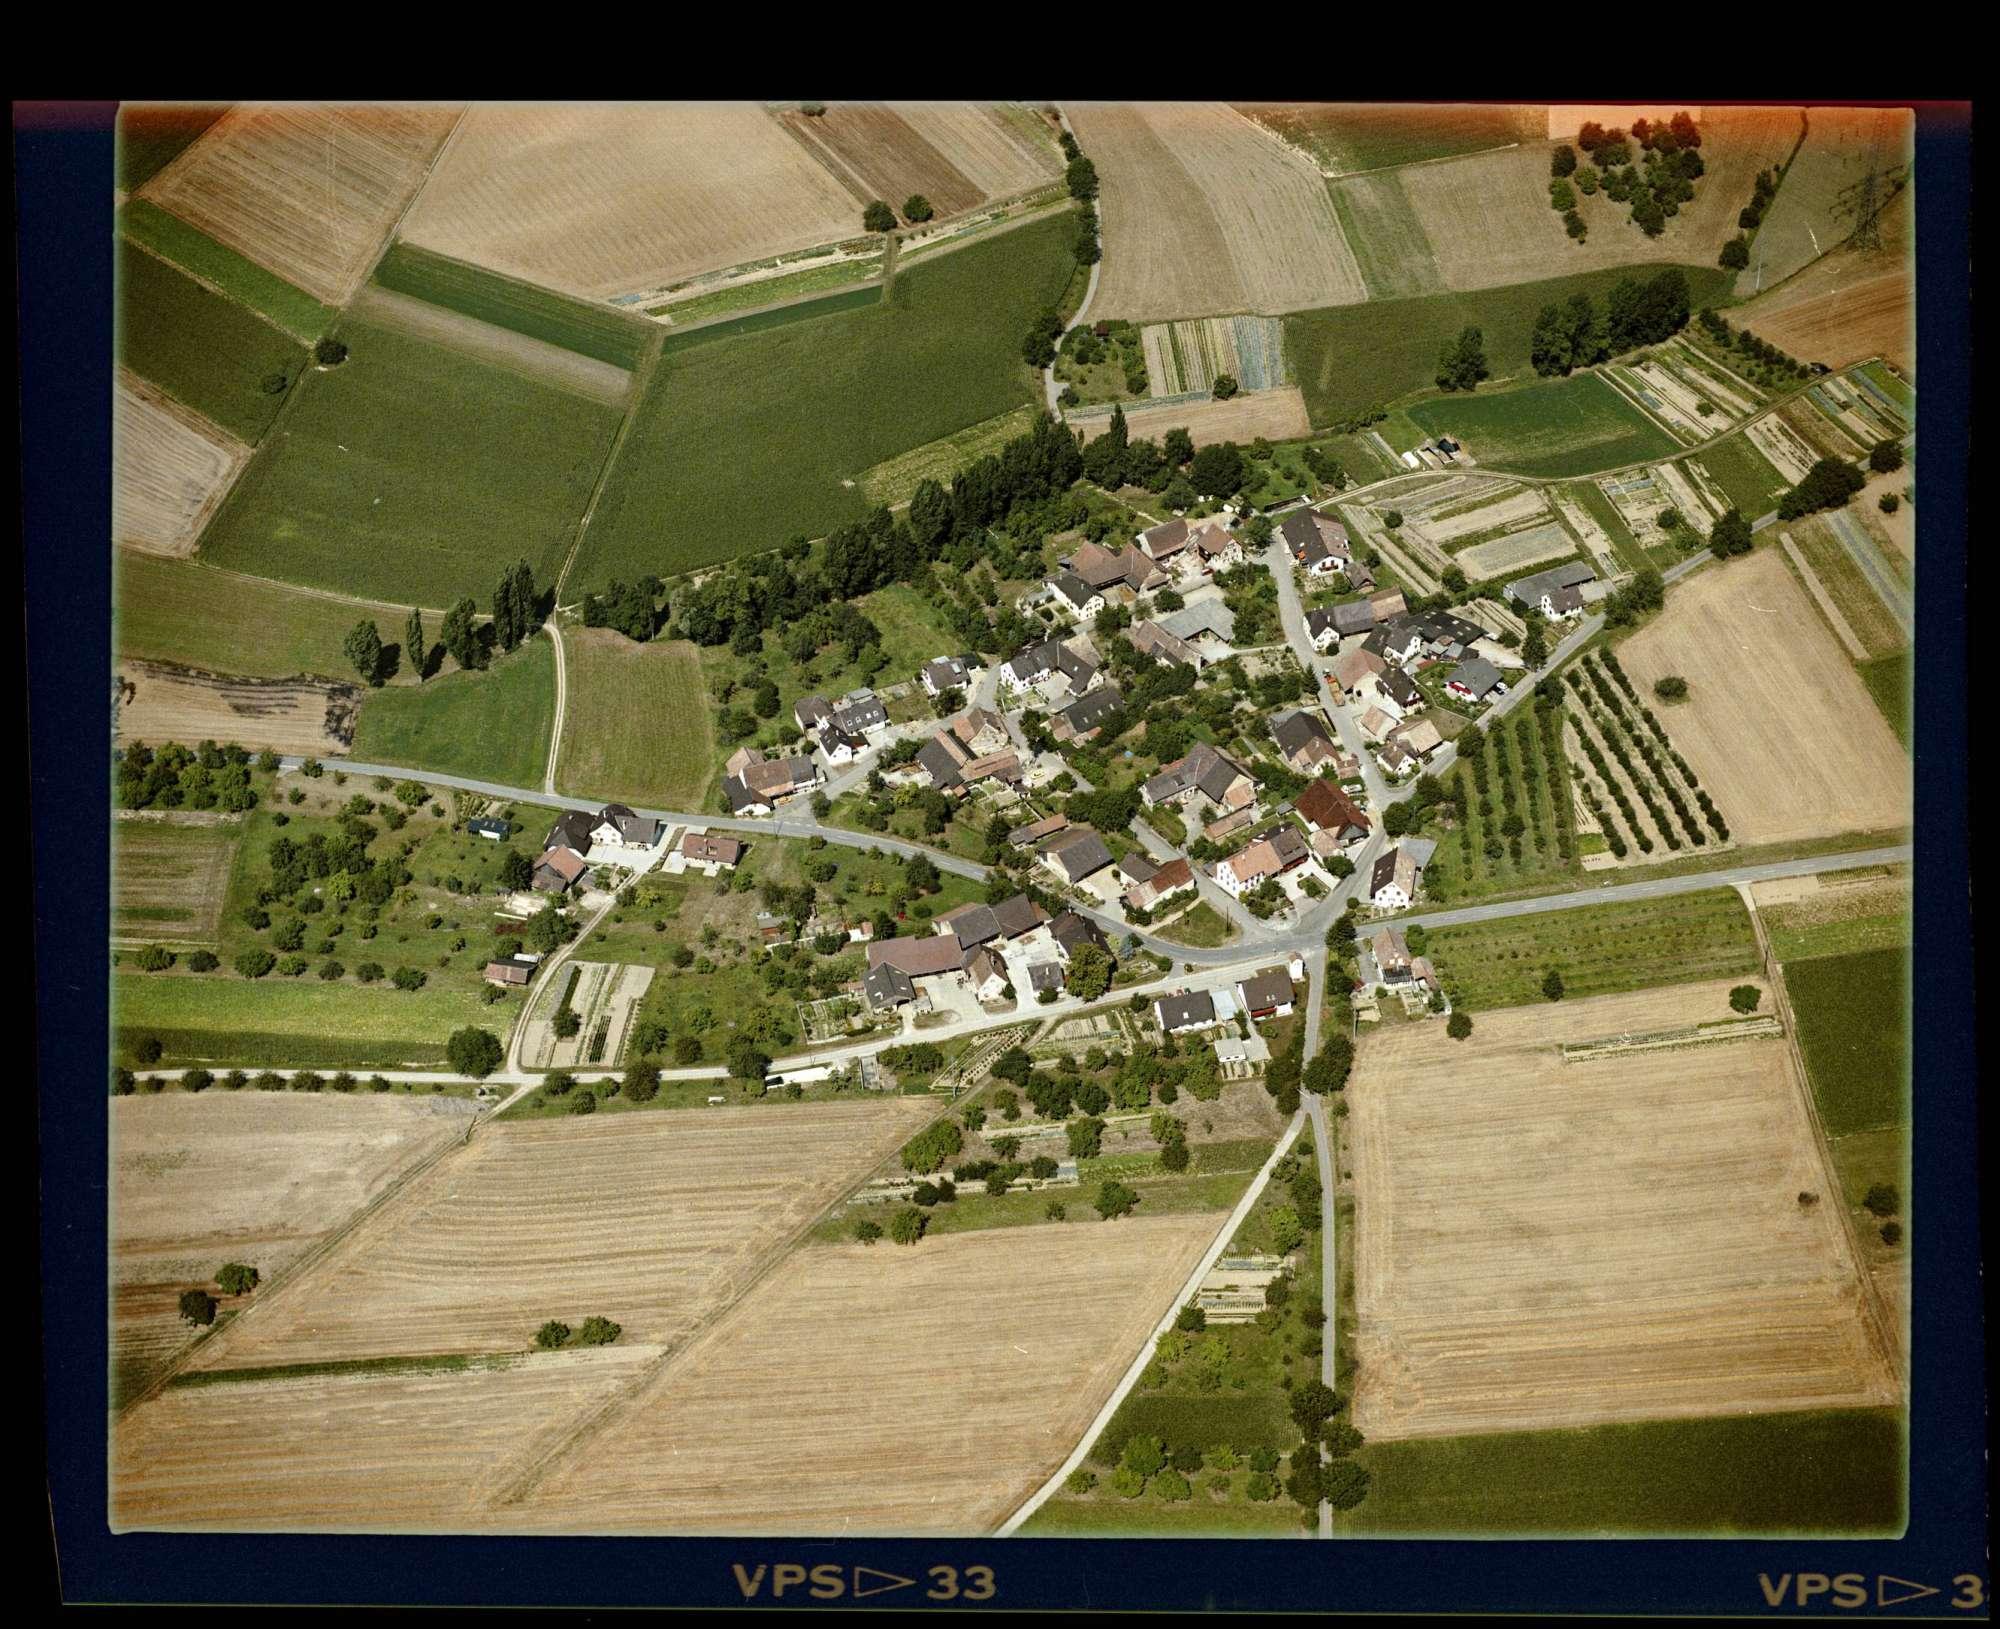 Gupf, Luftbild, Bild 1